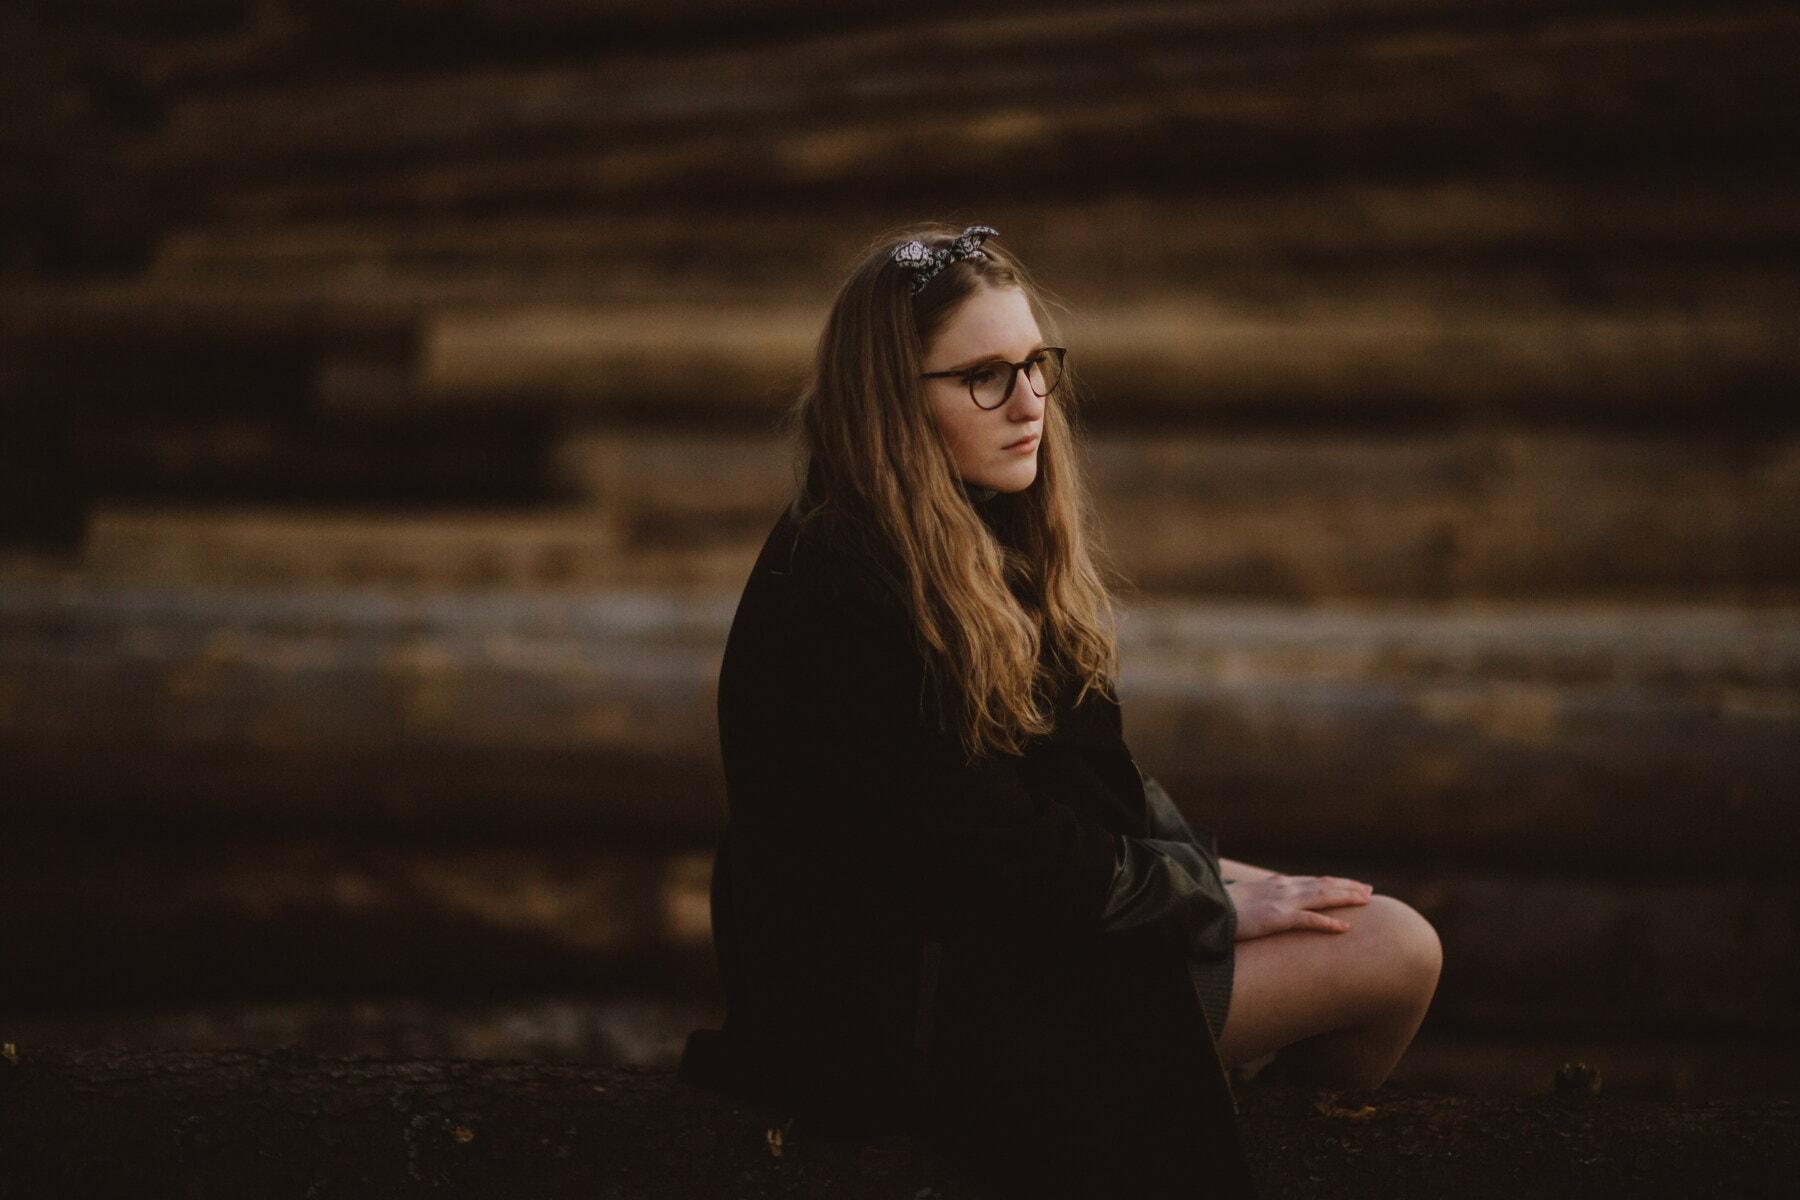 teenager, pretty girl, alone, sadness, nostalgia, depression, emotion, think, pretty, hair